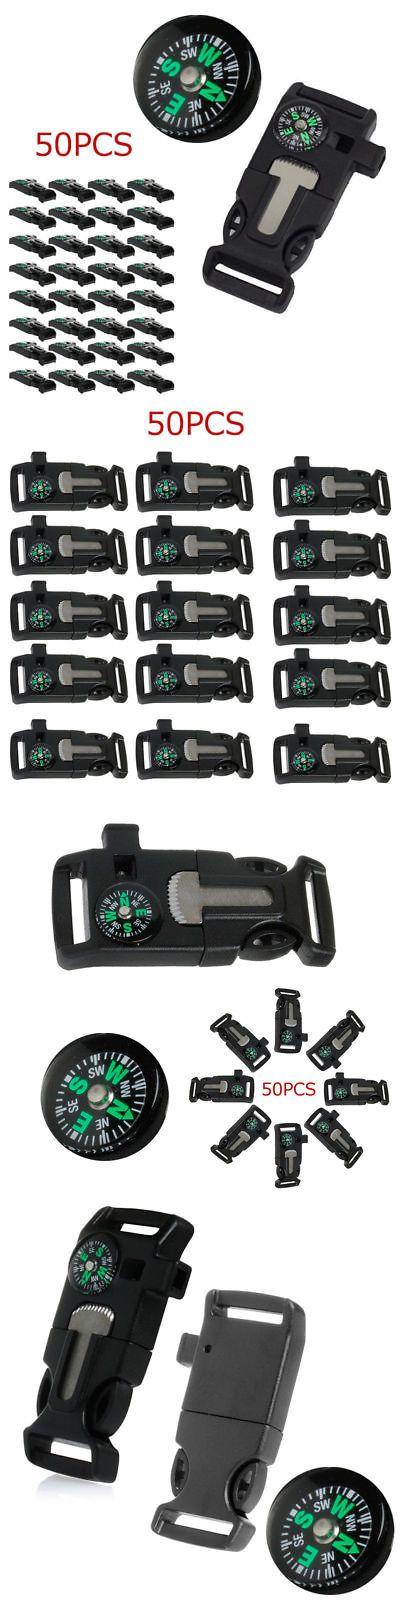 Paracord Bracelets 181413: 50X New Side Buckle Whistle Compass Flint Fire Starter Scaper Paracord Bracelet -> BUY IT NOW ONLY: $31.54 on eBay!